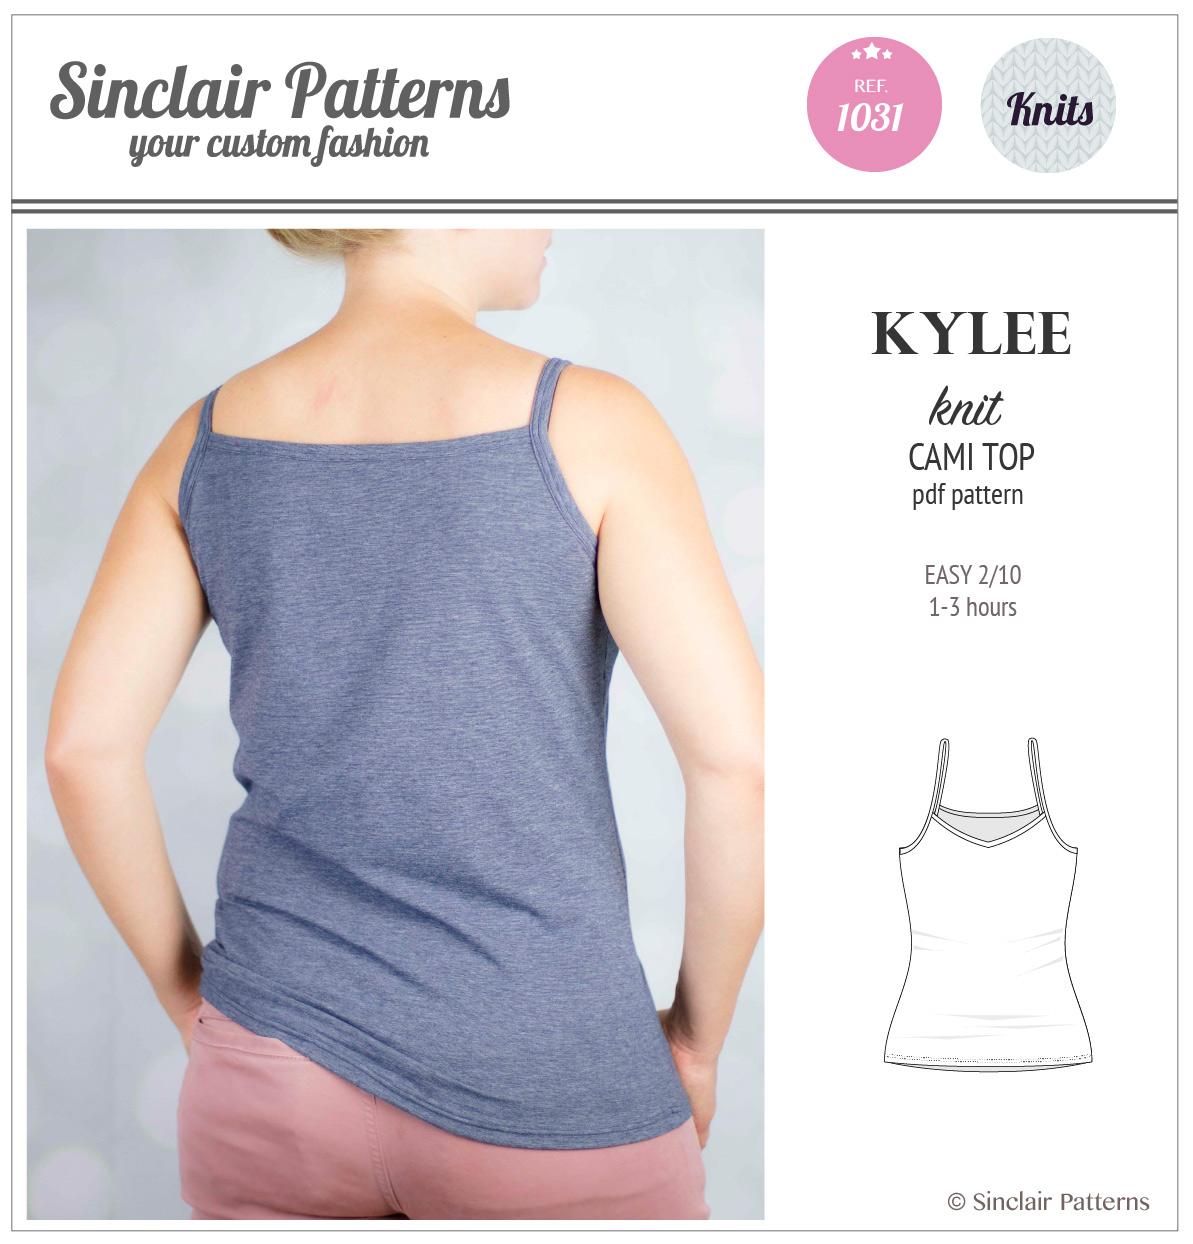 Kylee knit classic cami top pdf sinclair patterns pdf sewing pattern sinclair patterns s1031 kylee knit cami top jeuxipadfo Gallery